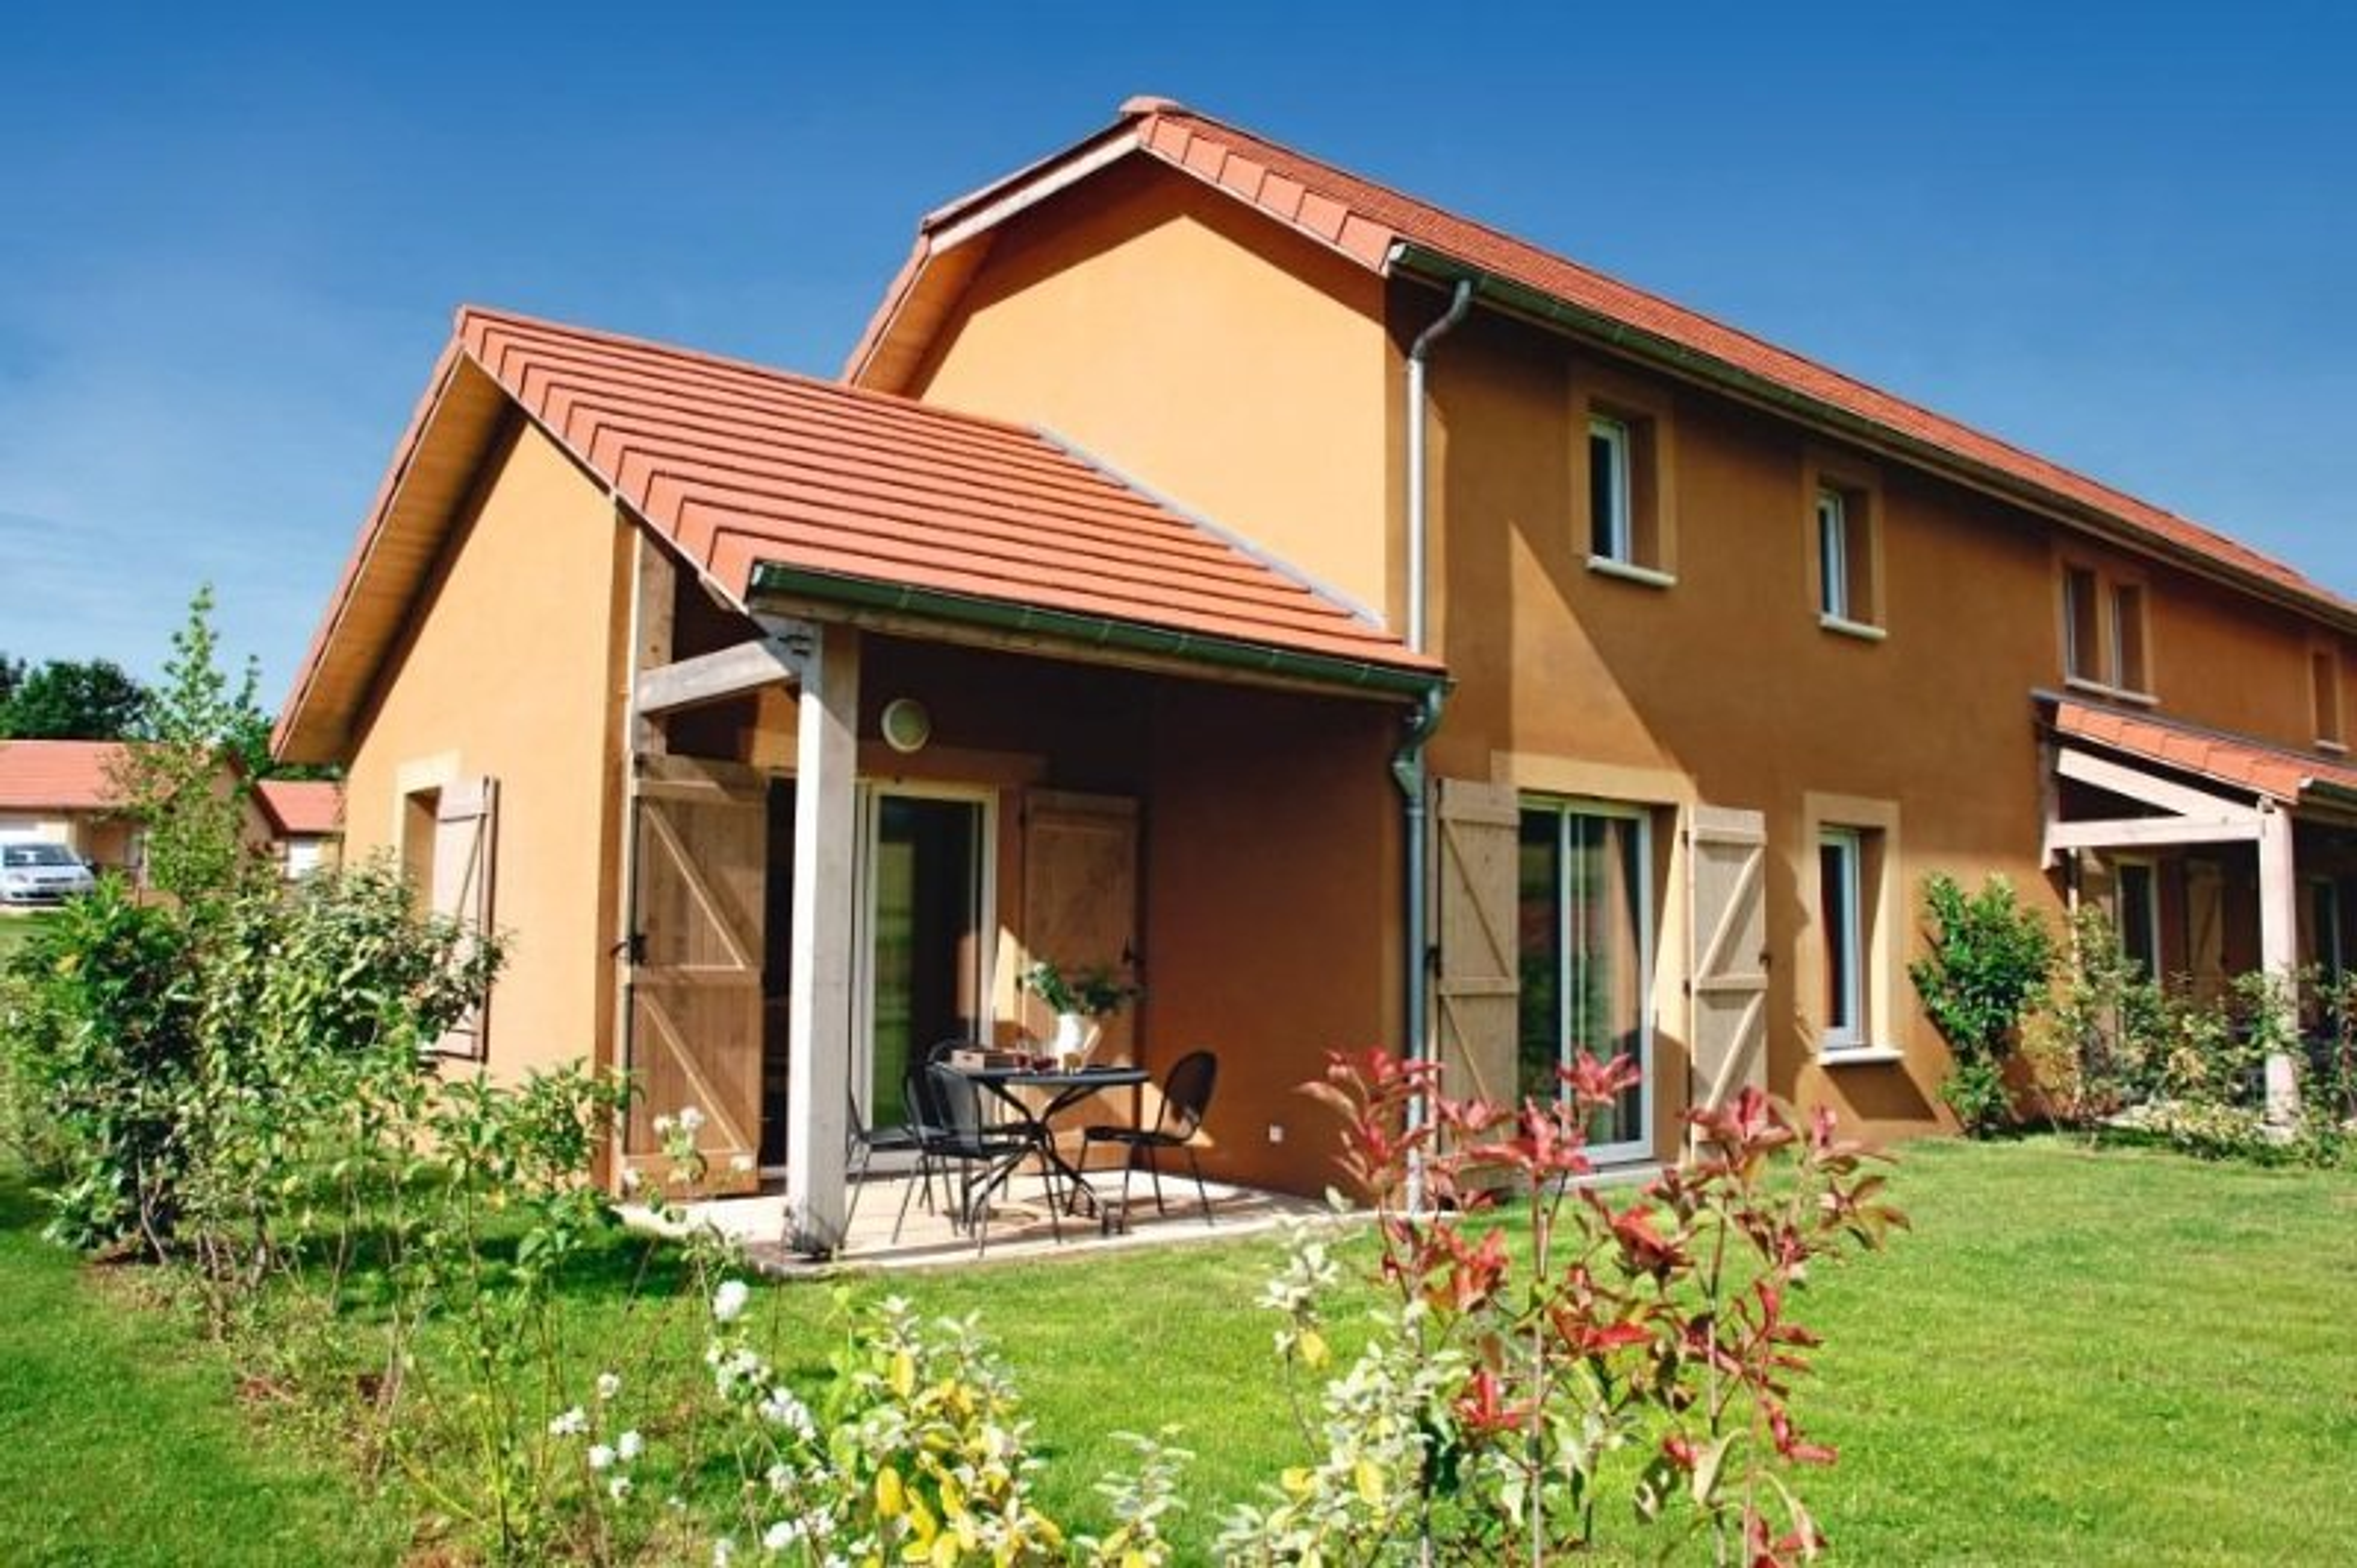 Club Belambra Les Portes de Dordogne, Lot